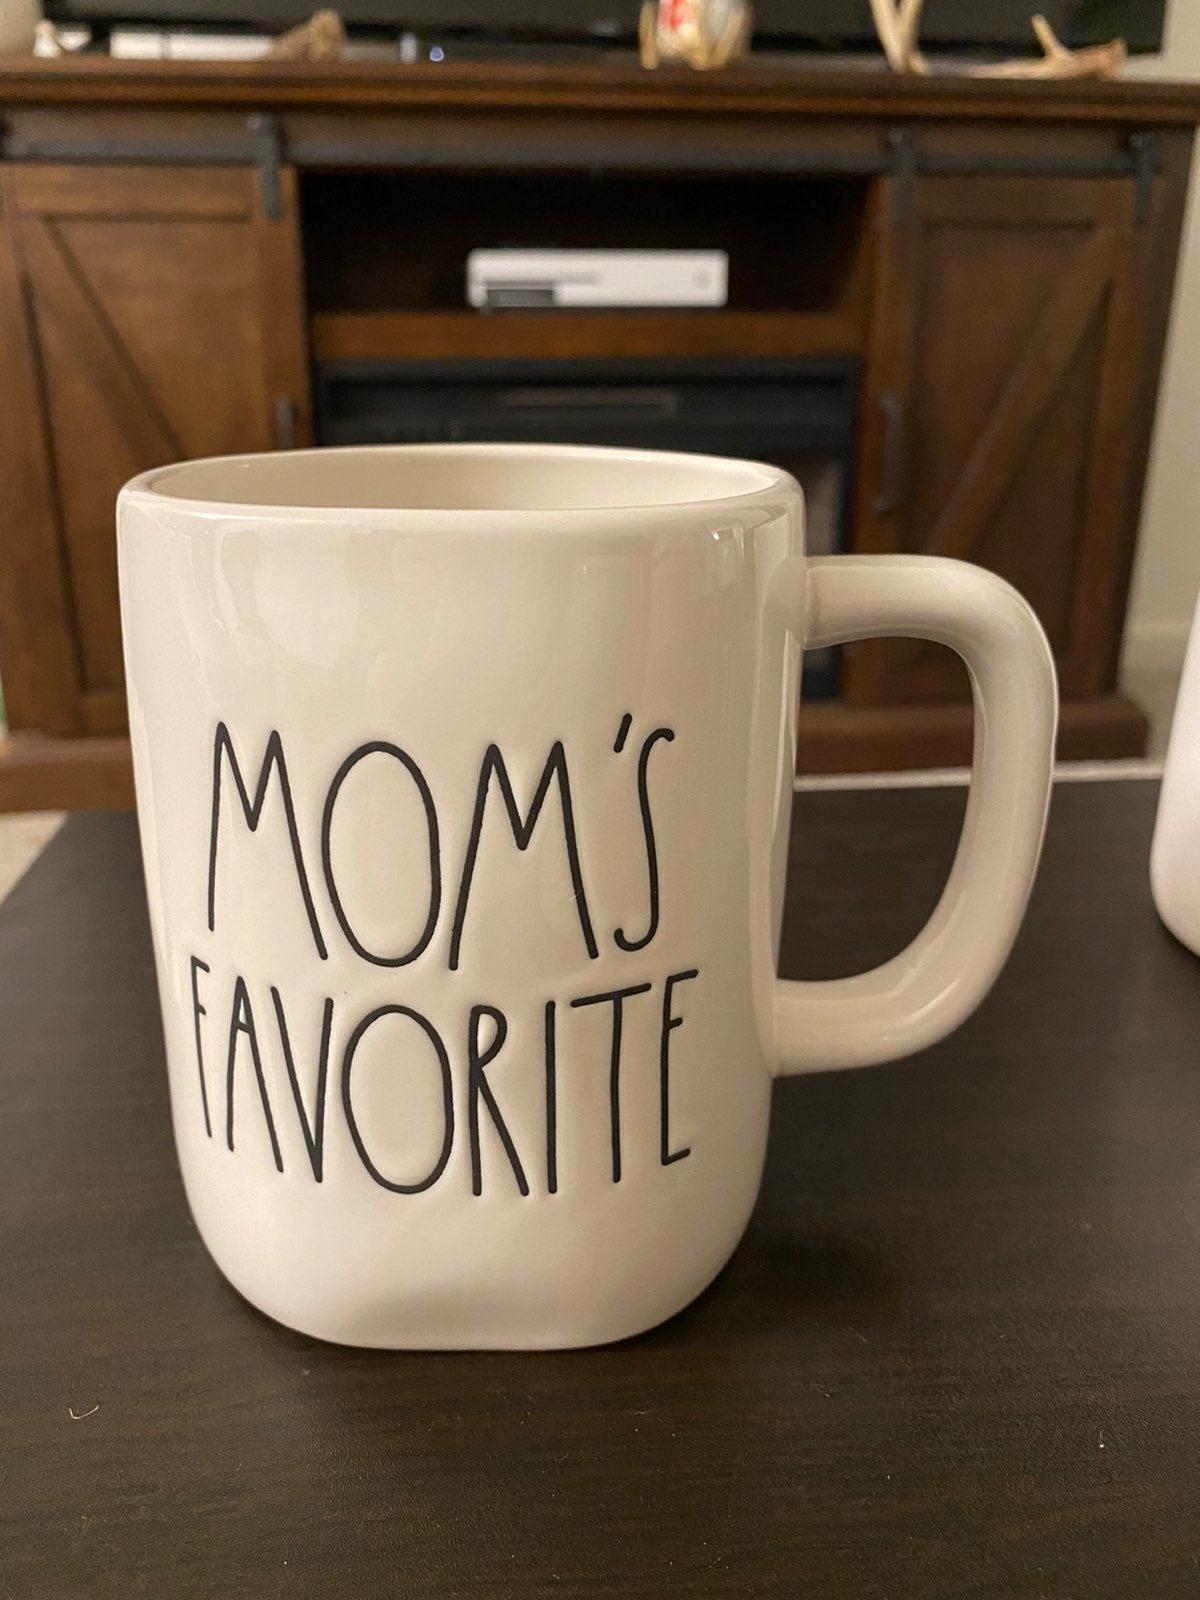 Rae Dunn moms favorite mug